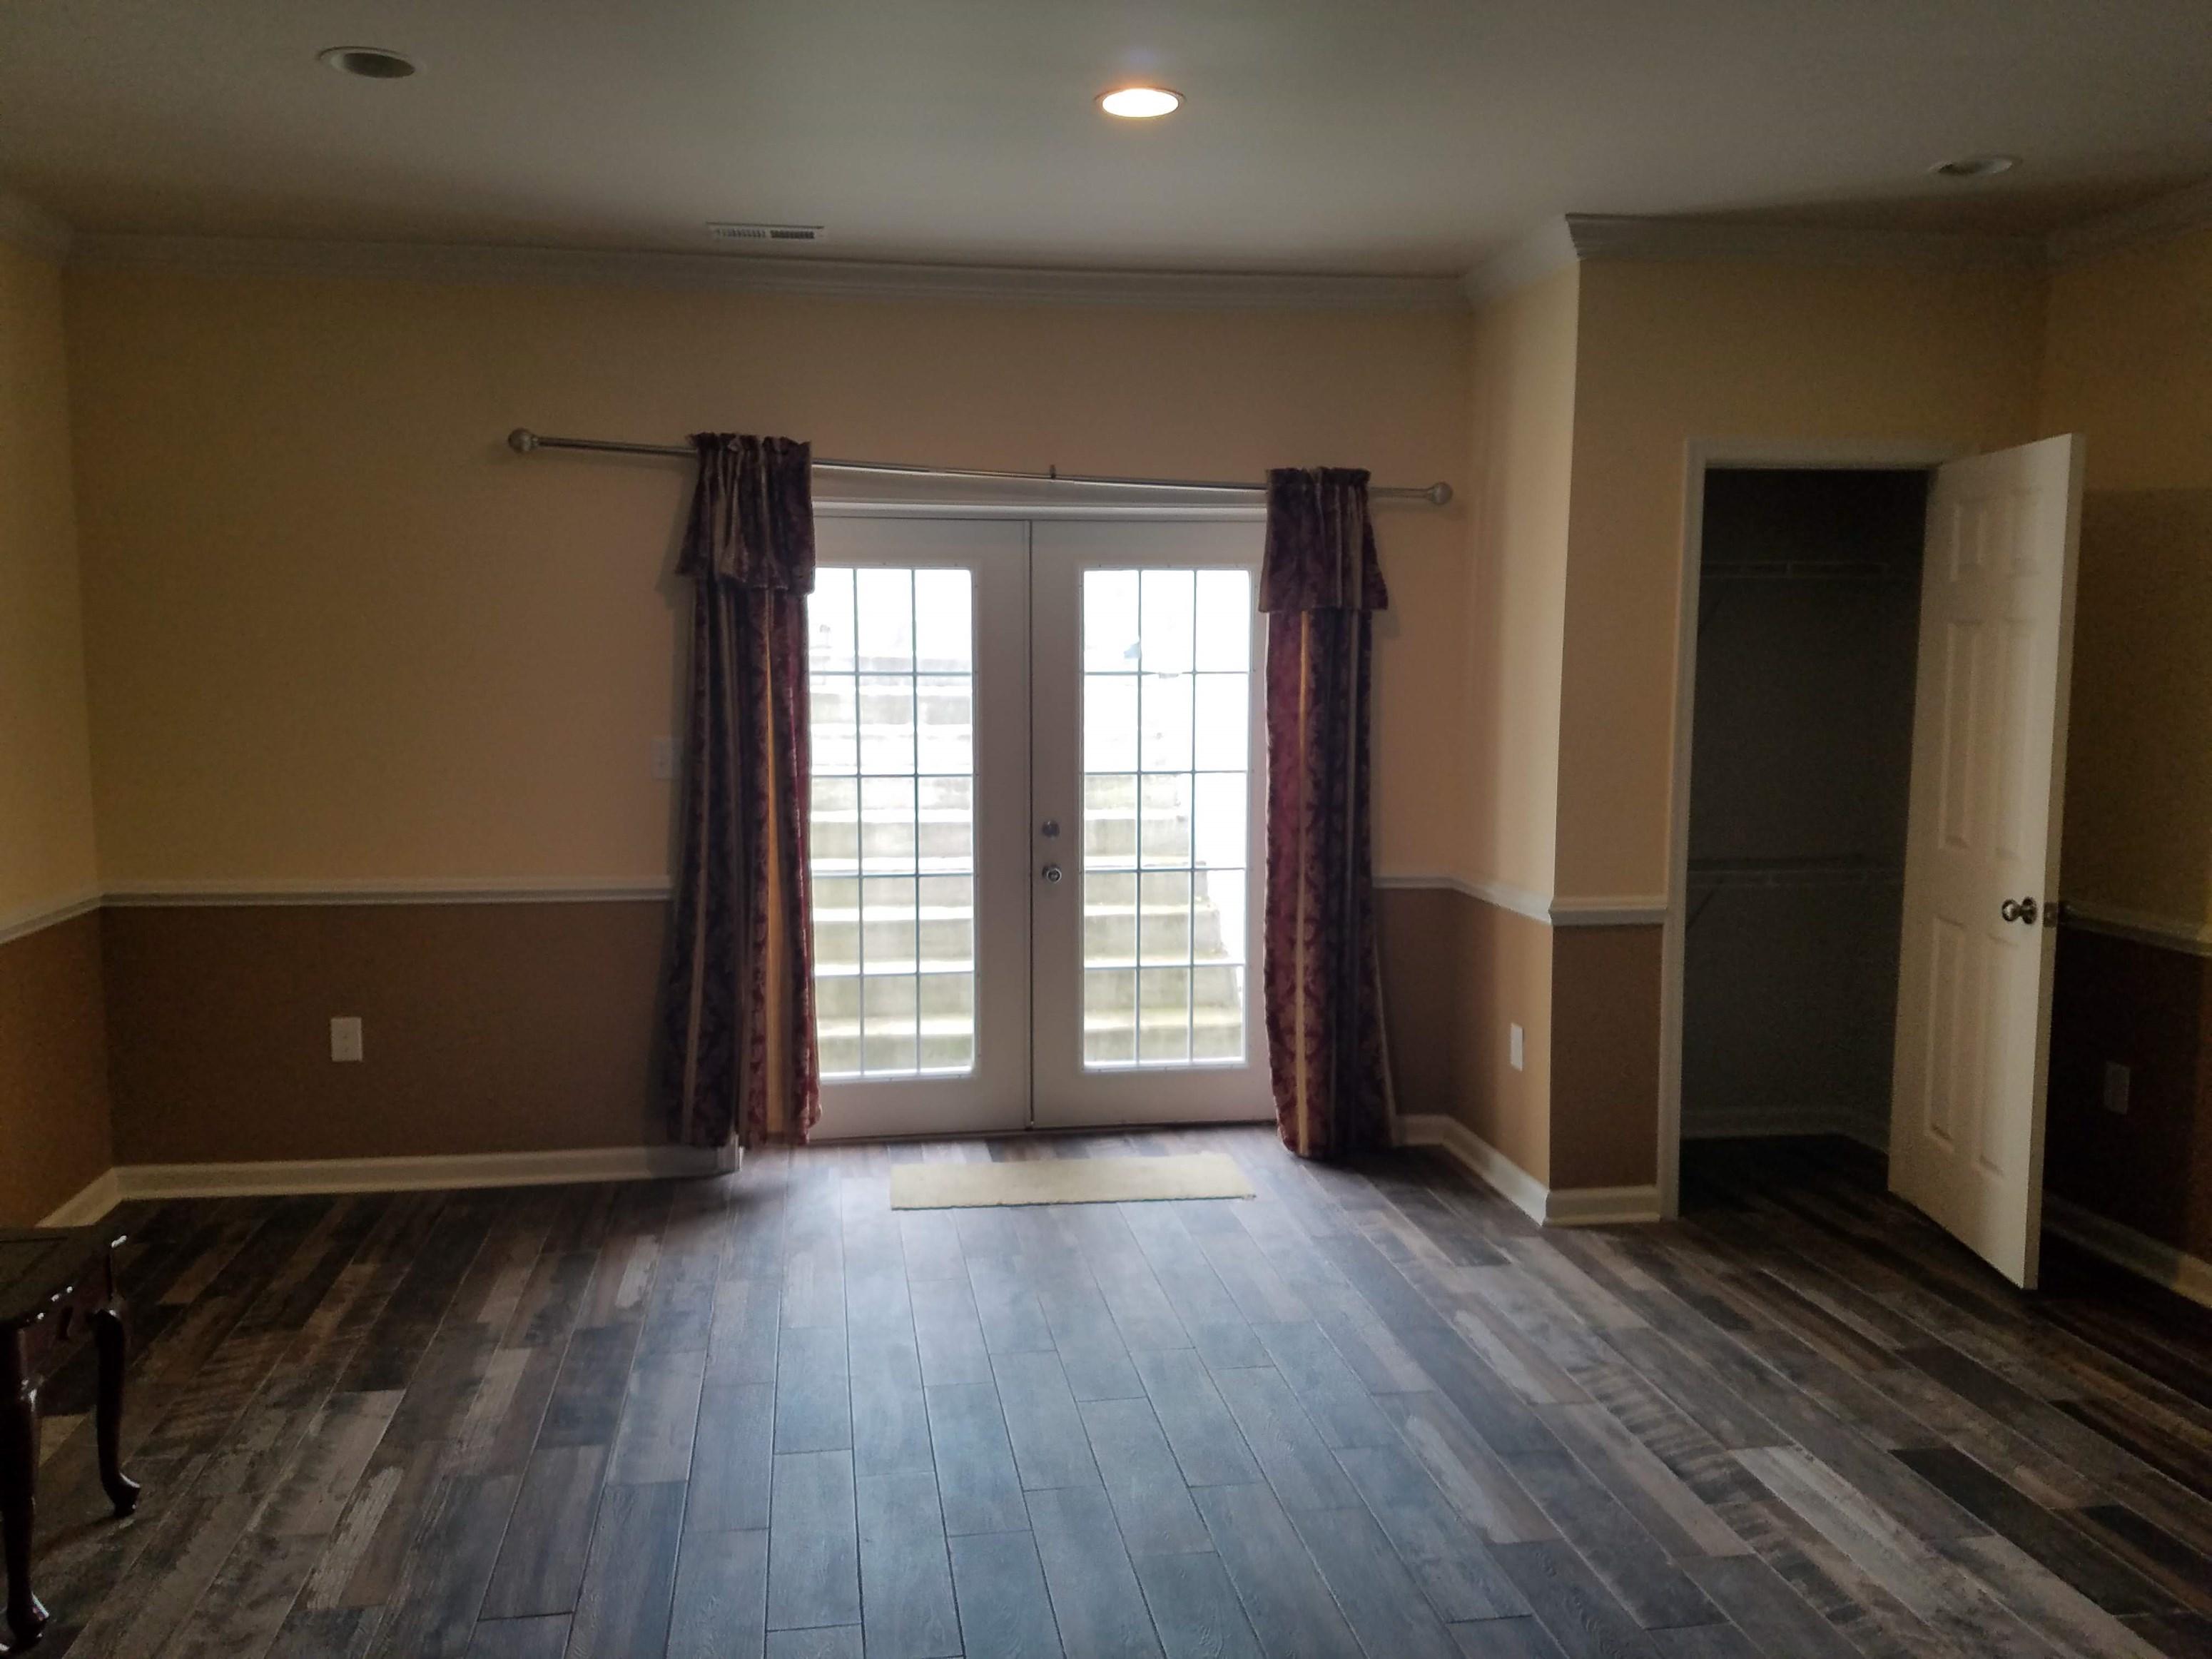 Basement For Rent In Rockville Md basement for rent - on montrose road, rockville | 2 bhk in rockville